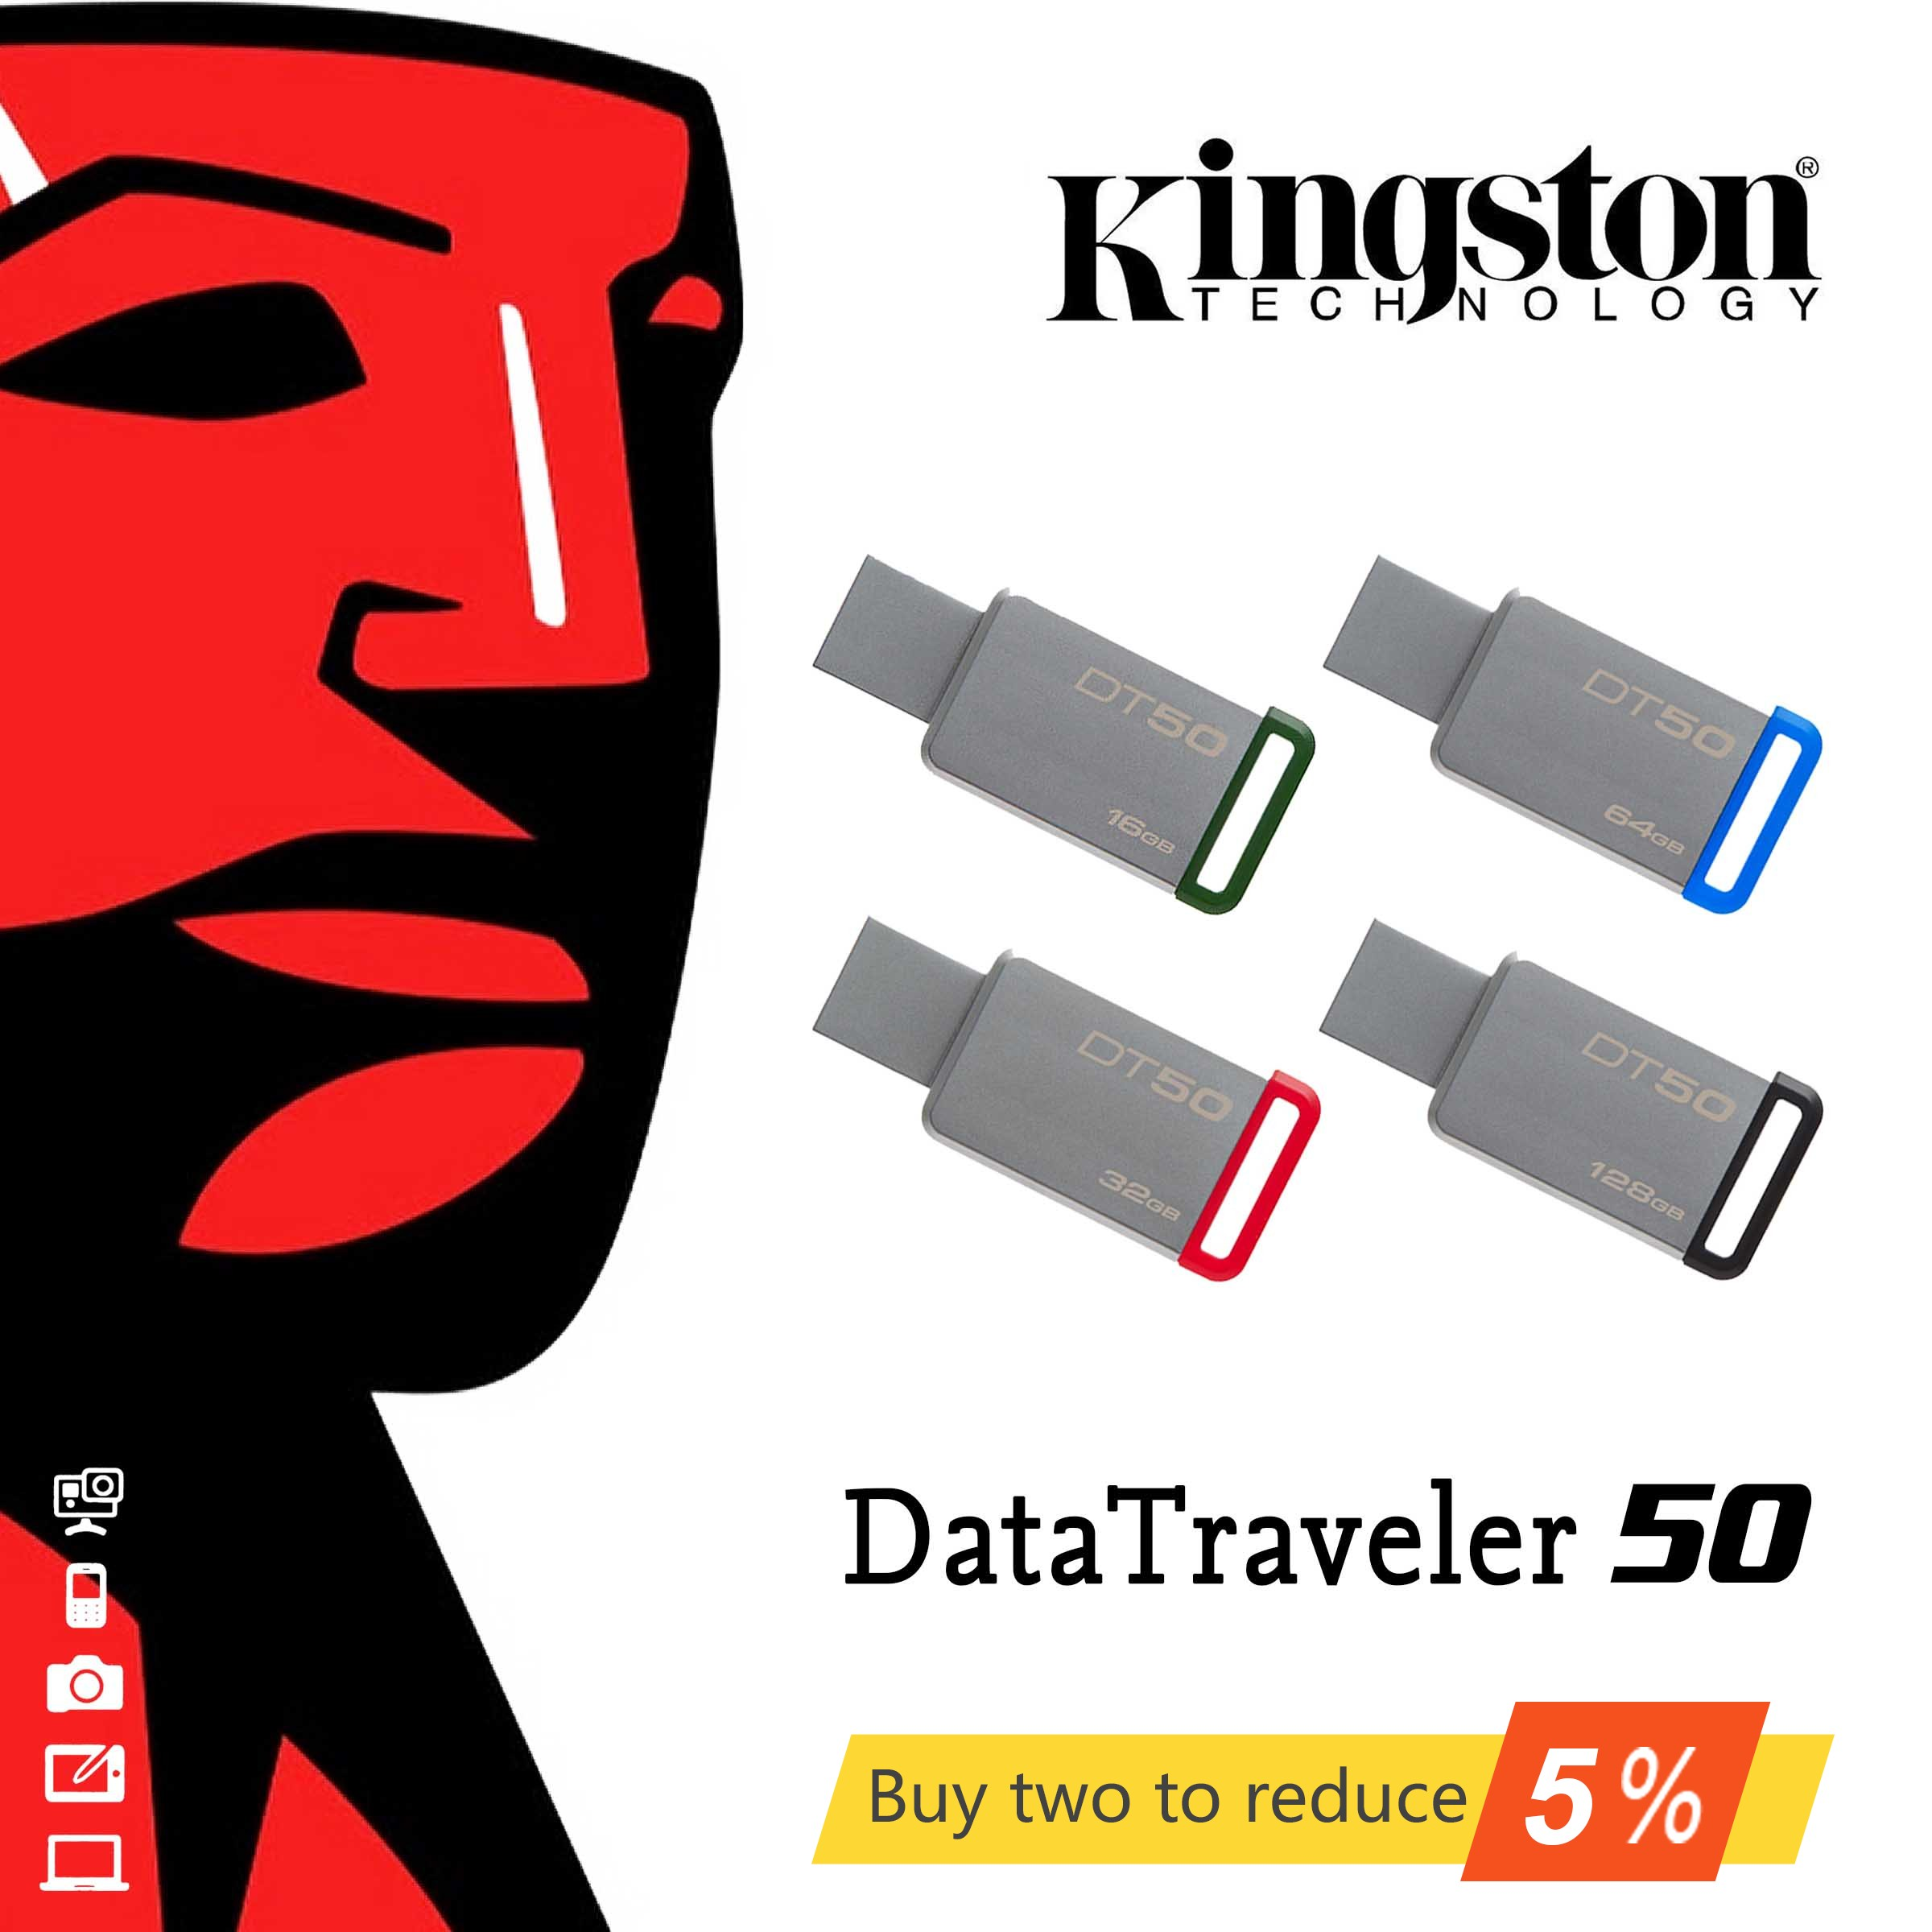 Aço inoxidável DT50 Original Kingston USB Drives Flash USB 3.1 GB 64 32GB 128GB U Disco USB Pen Drive Vara 16 32 64 Pendrives GB